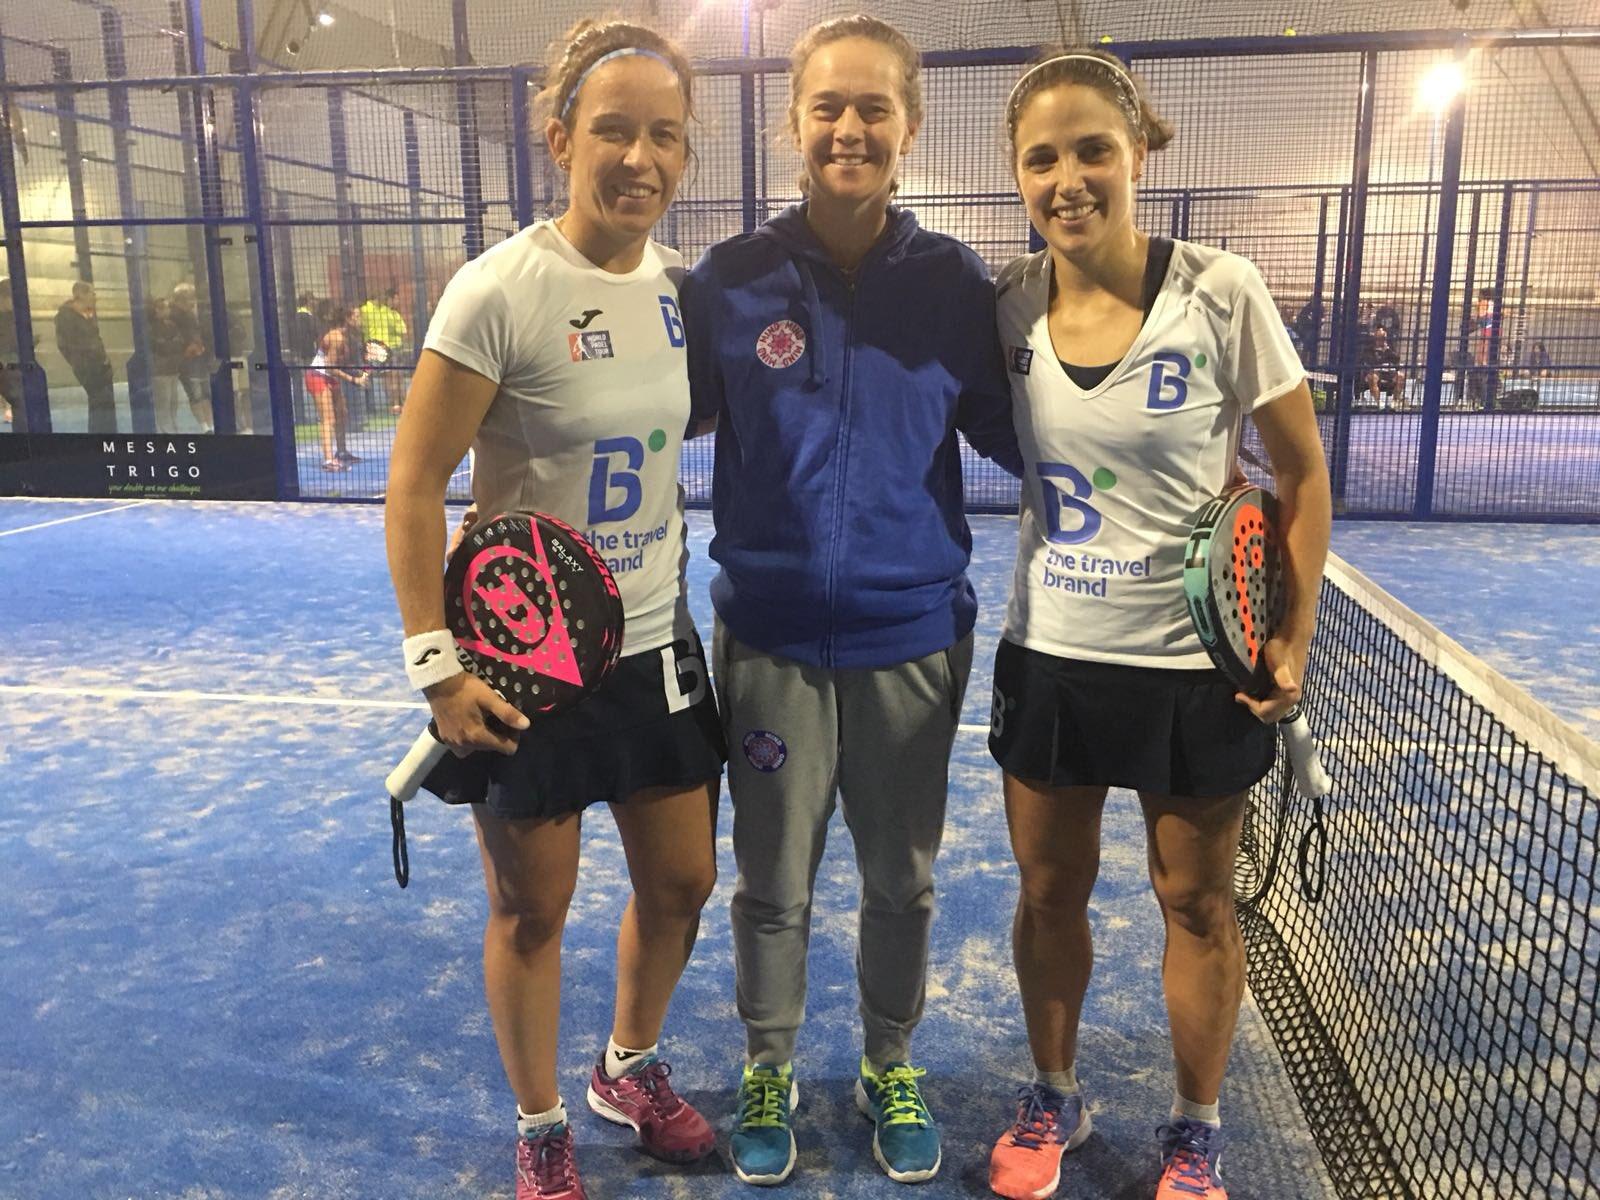 patty llaguno y eli amatriain dieciseisavos final wpt andorra open 2018